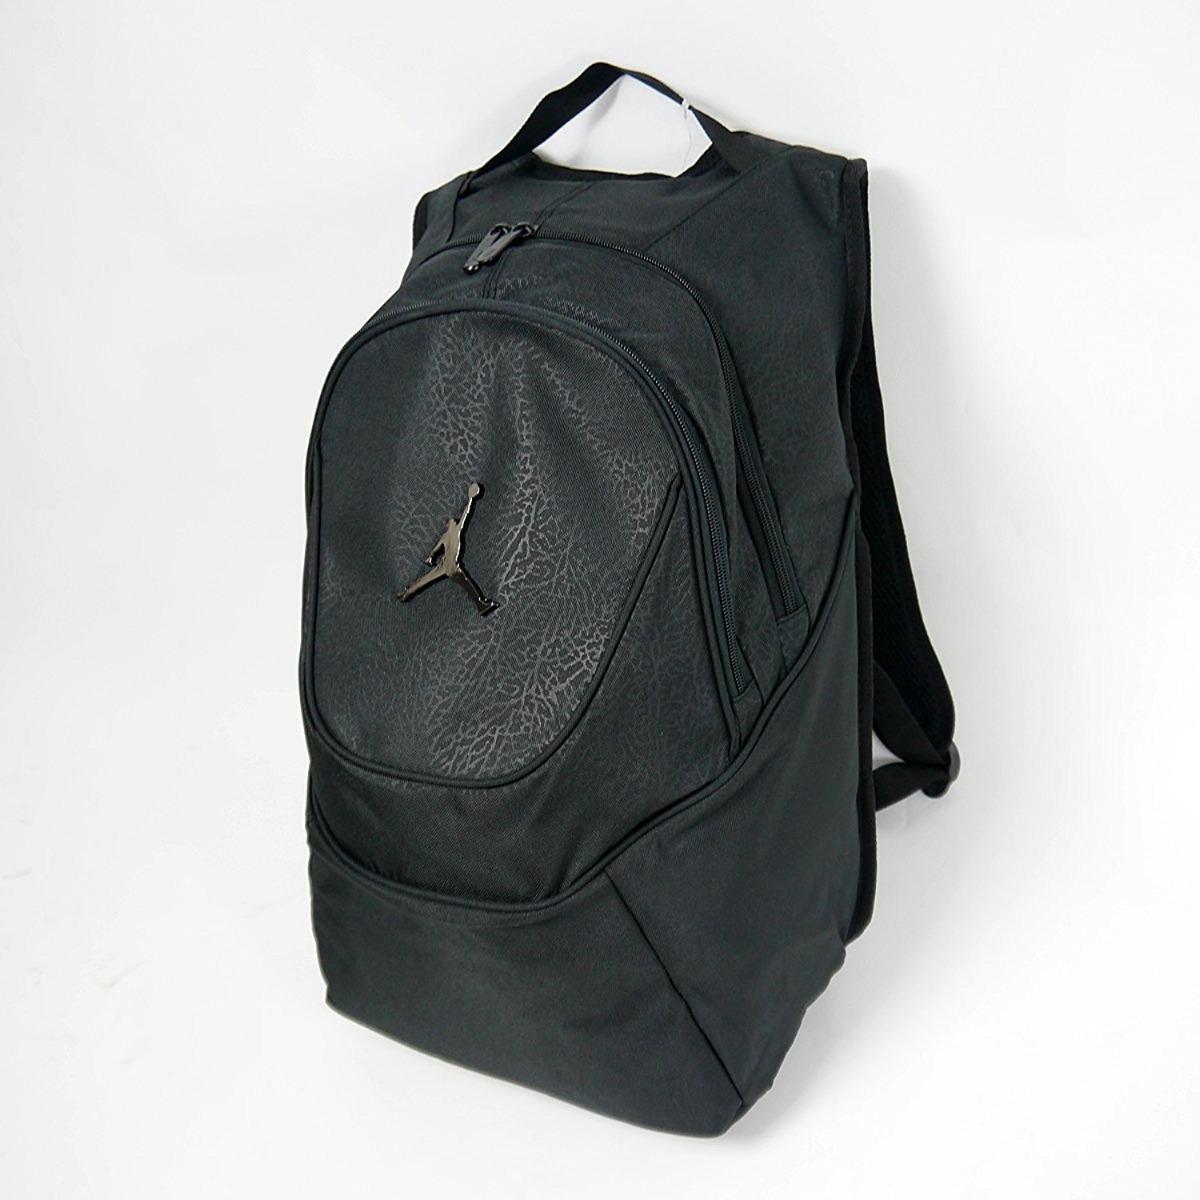 e5d1a25e9423 mochila jordan jumpman elementary bagpack black print. Cargando zoom.